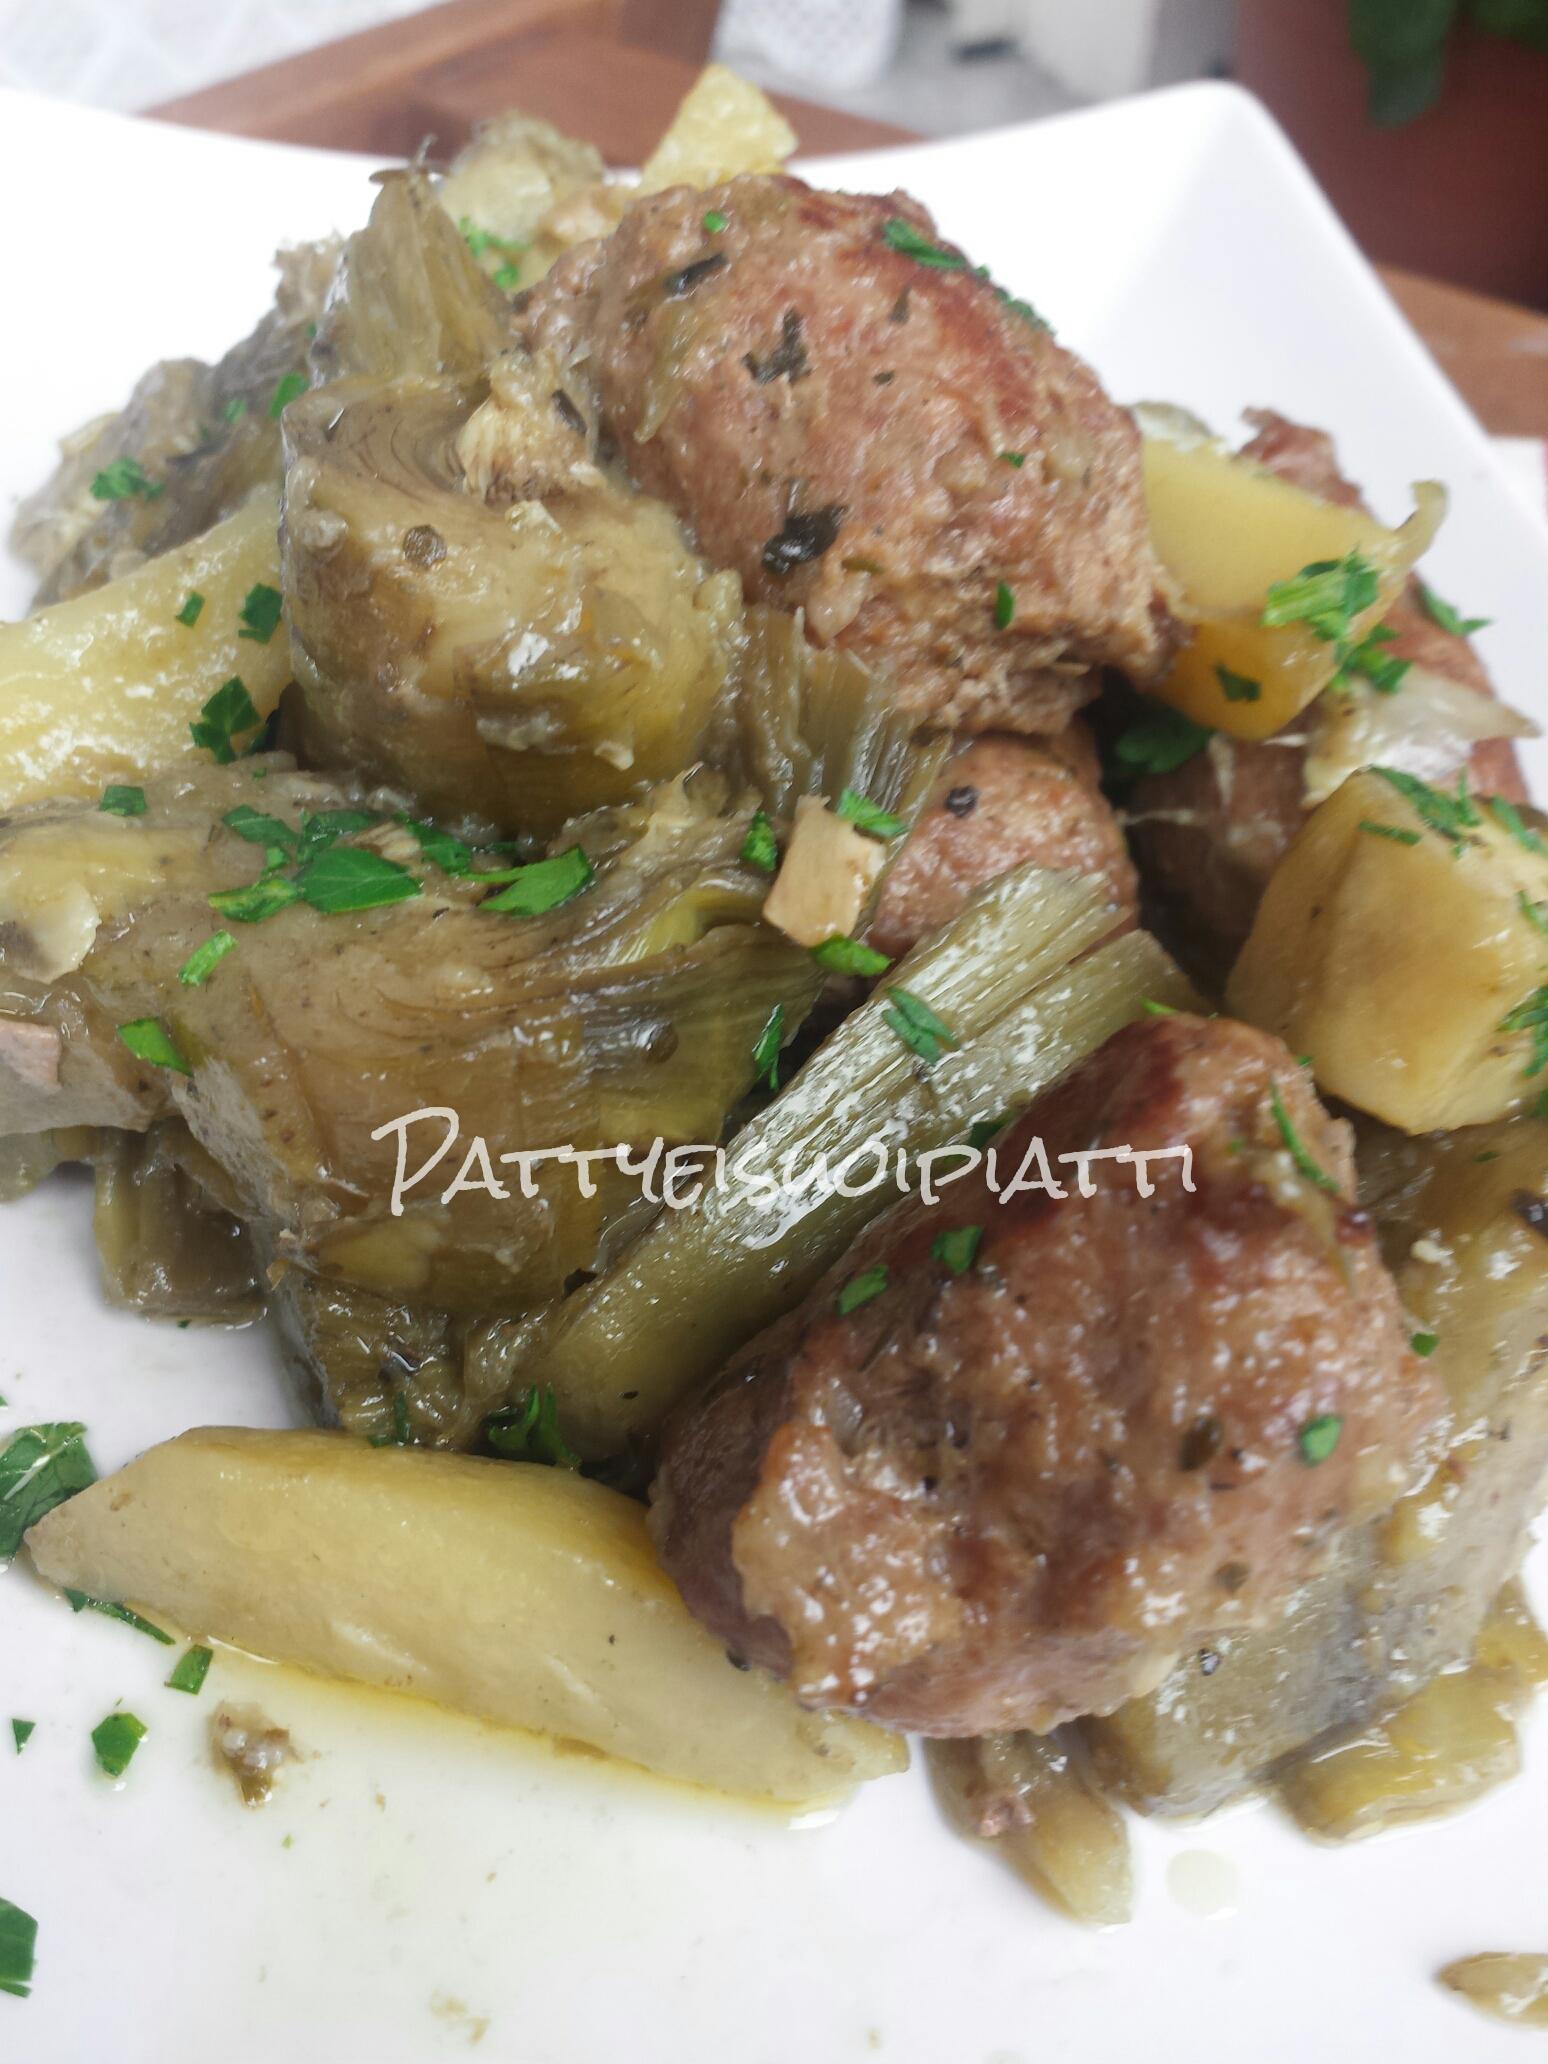 Patate carciofi e salsiccia